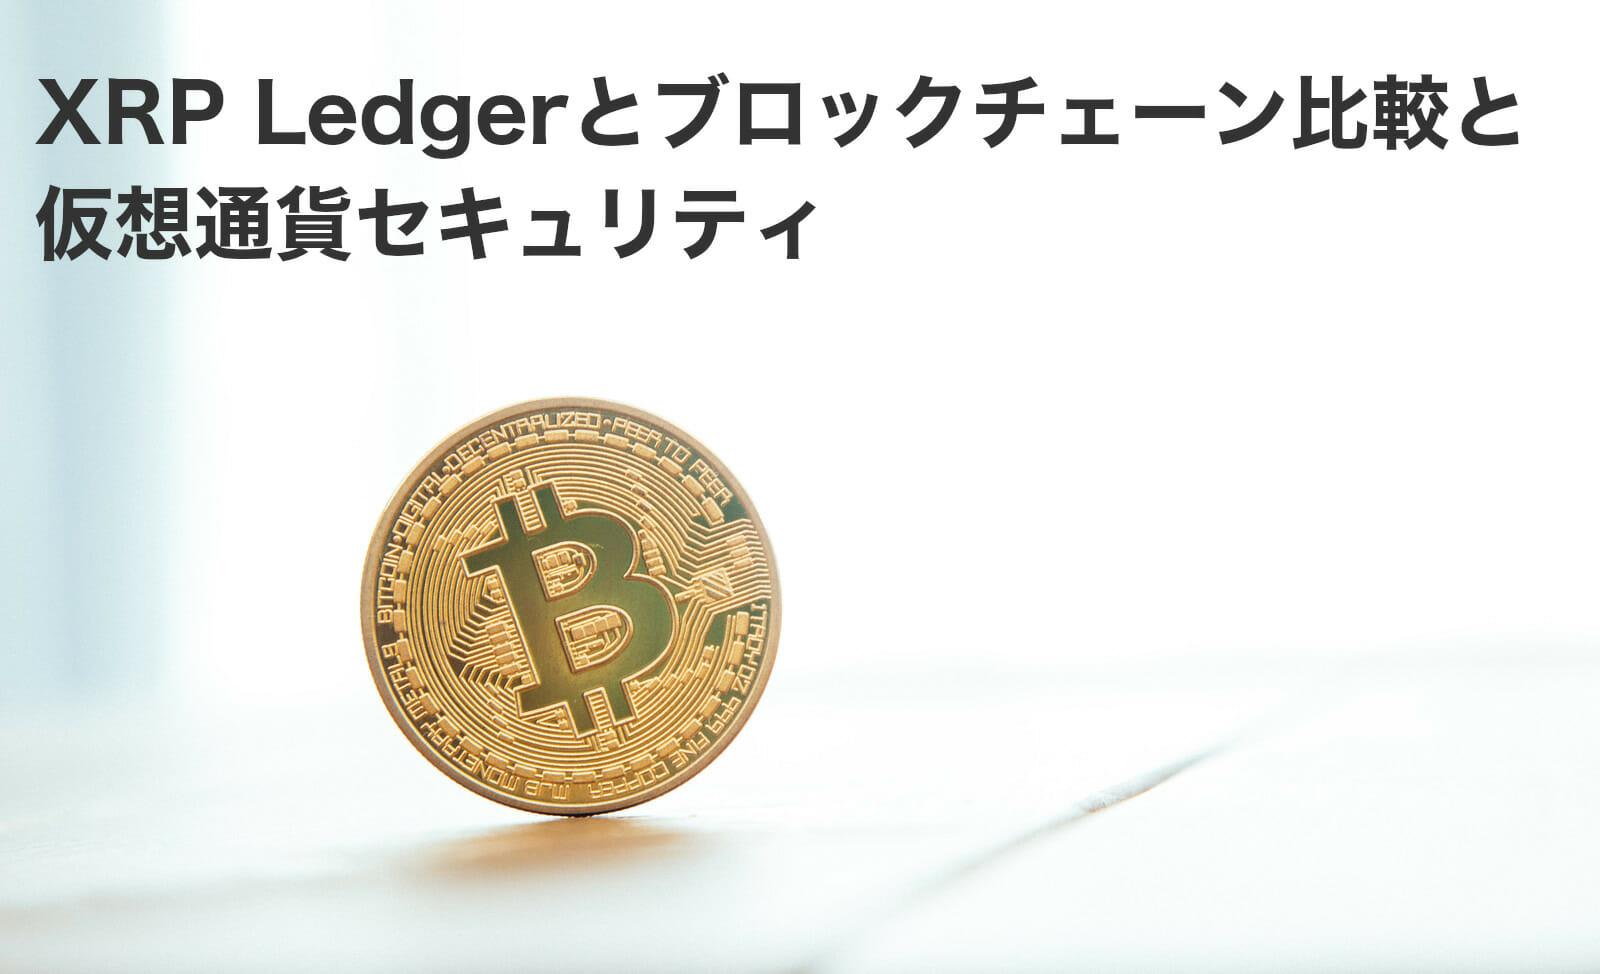 XRP Ledgerとブロックチェーン比較と仮想通貨セキュリティ